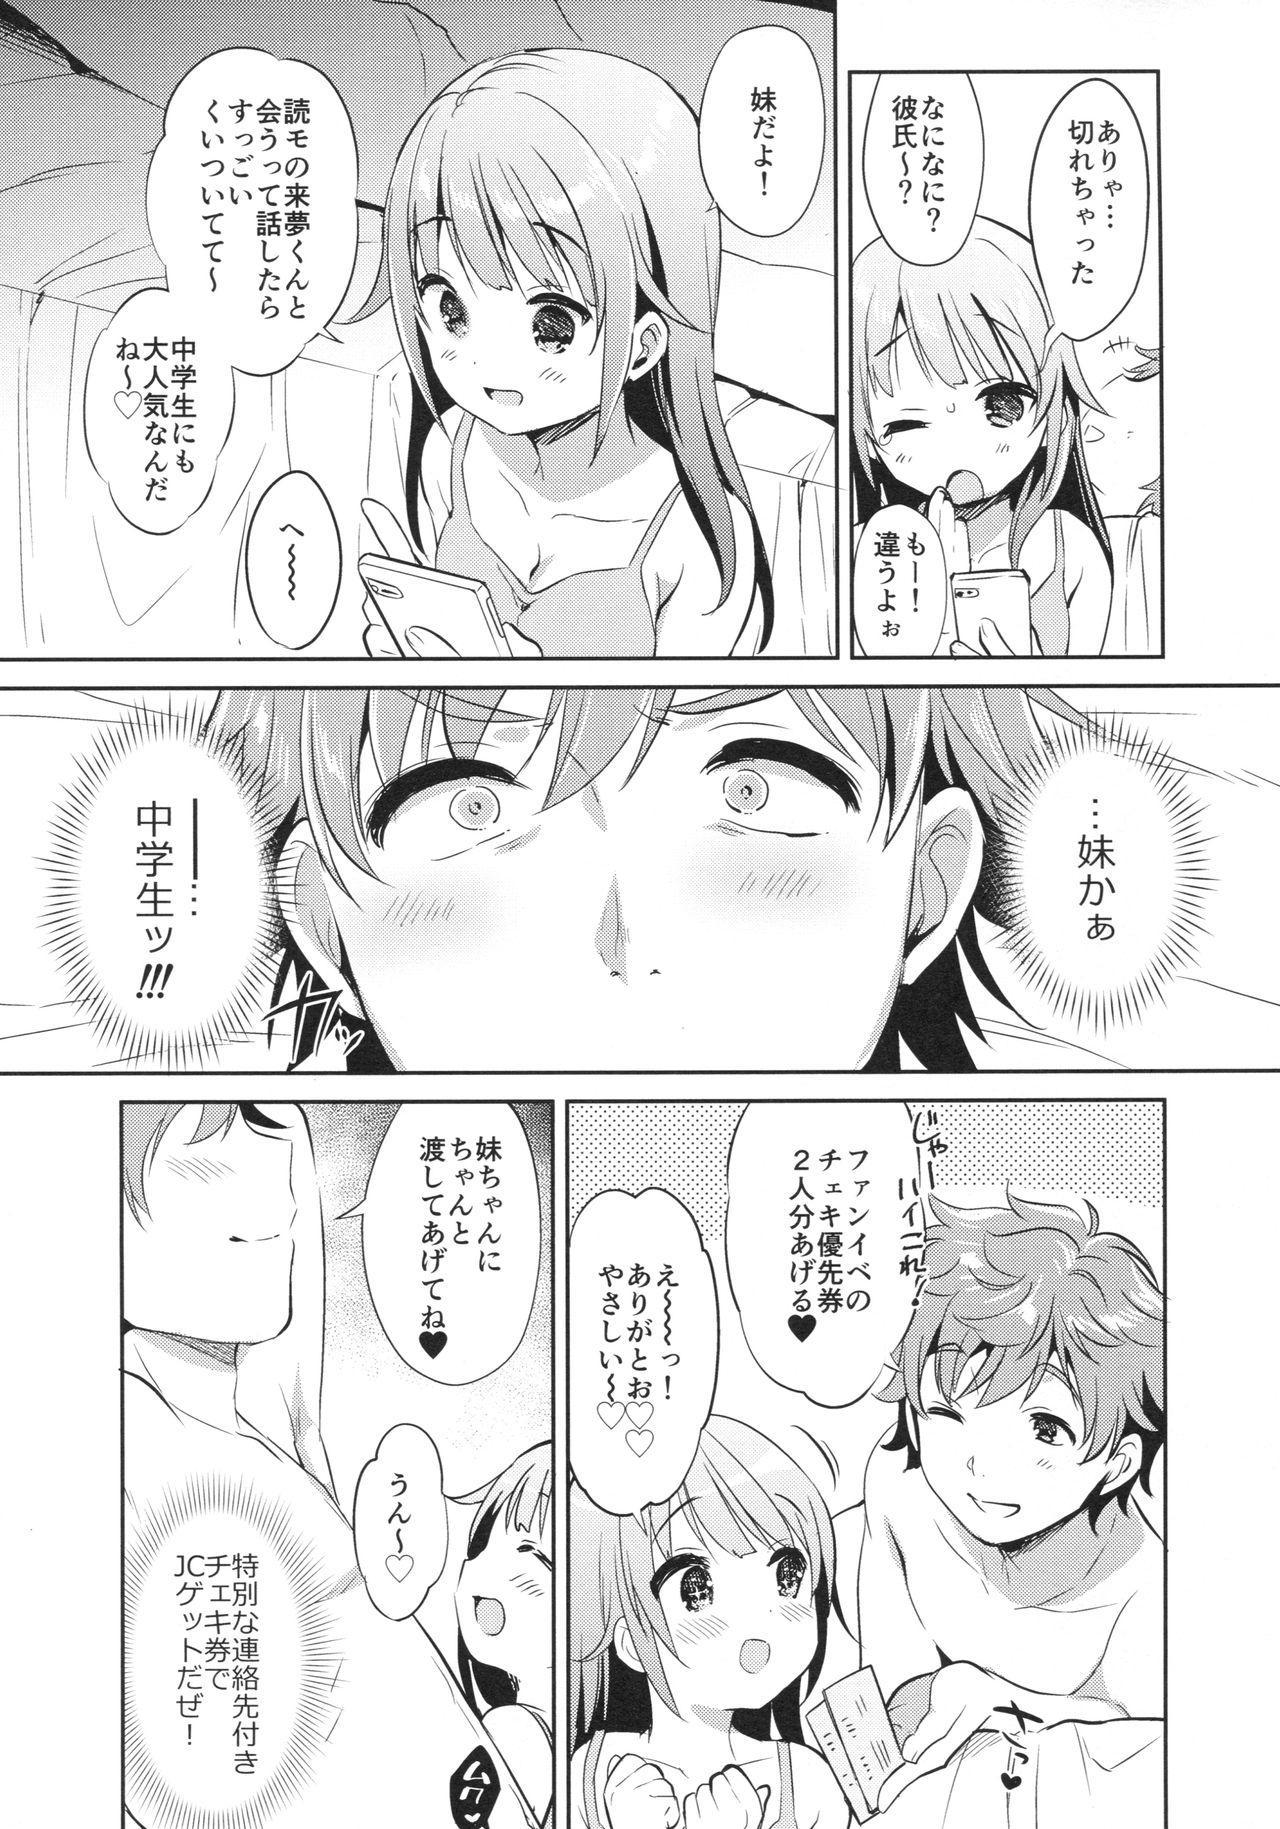 Dokumo Lime CASE FILE 2 7